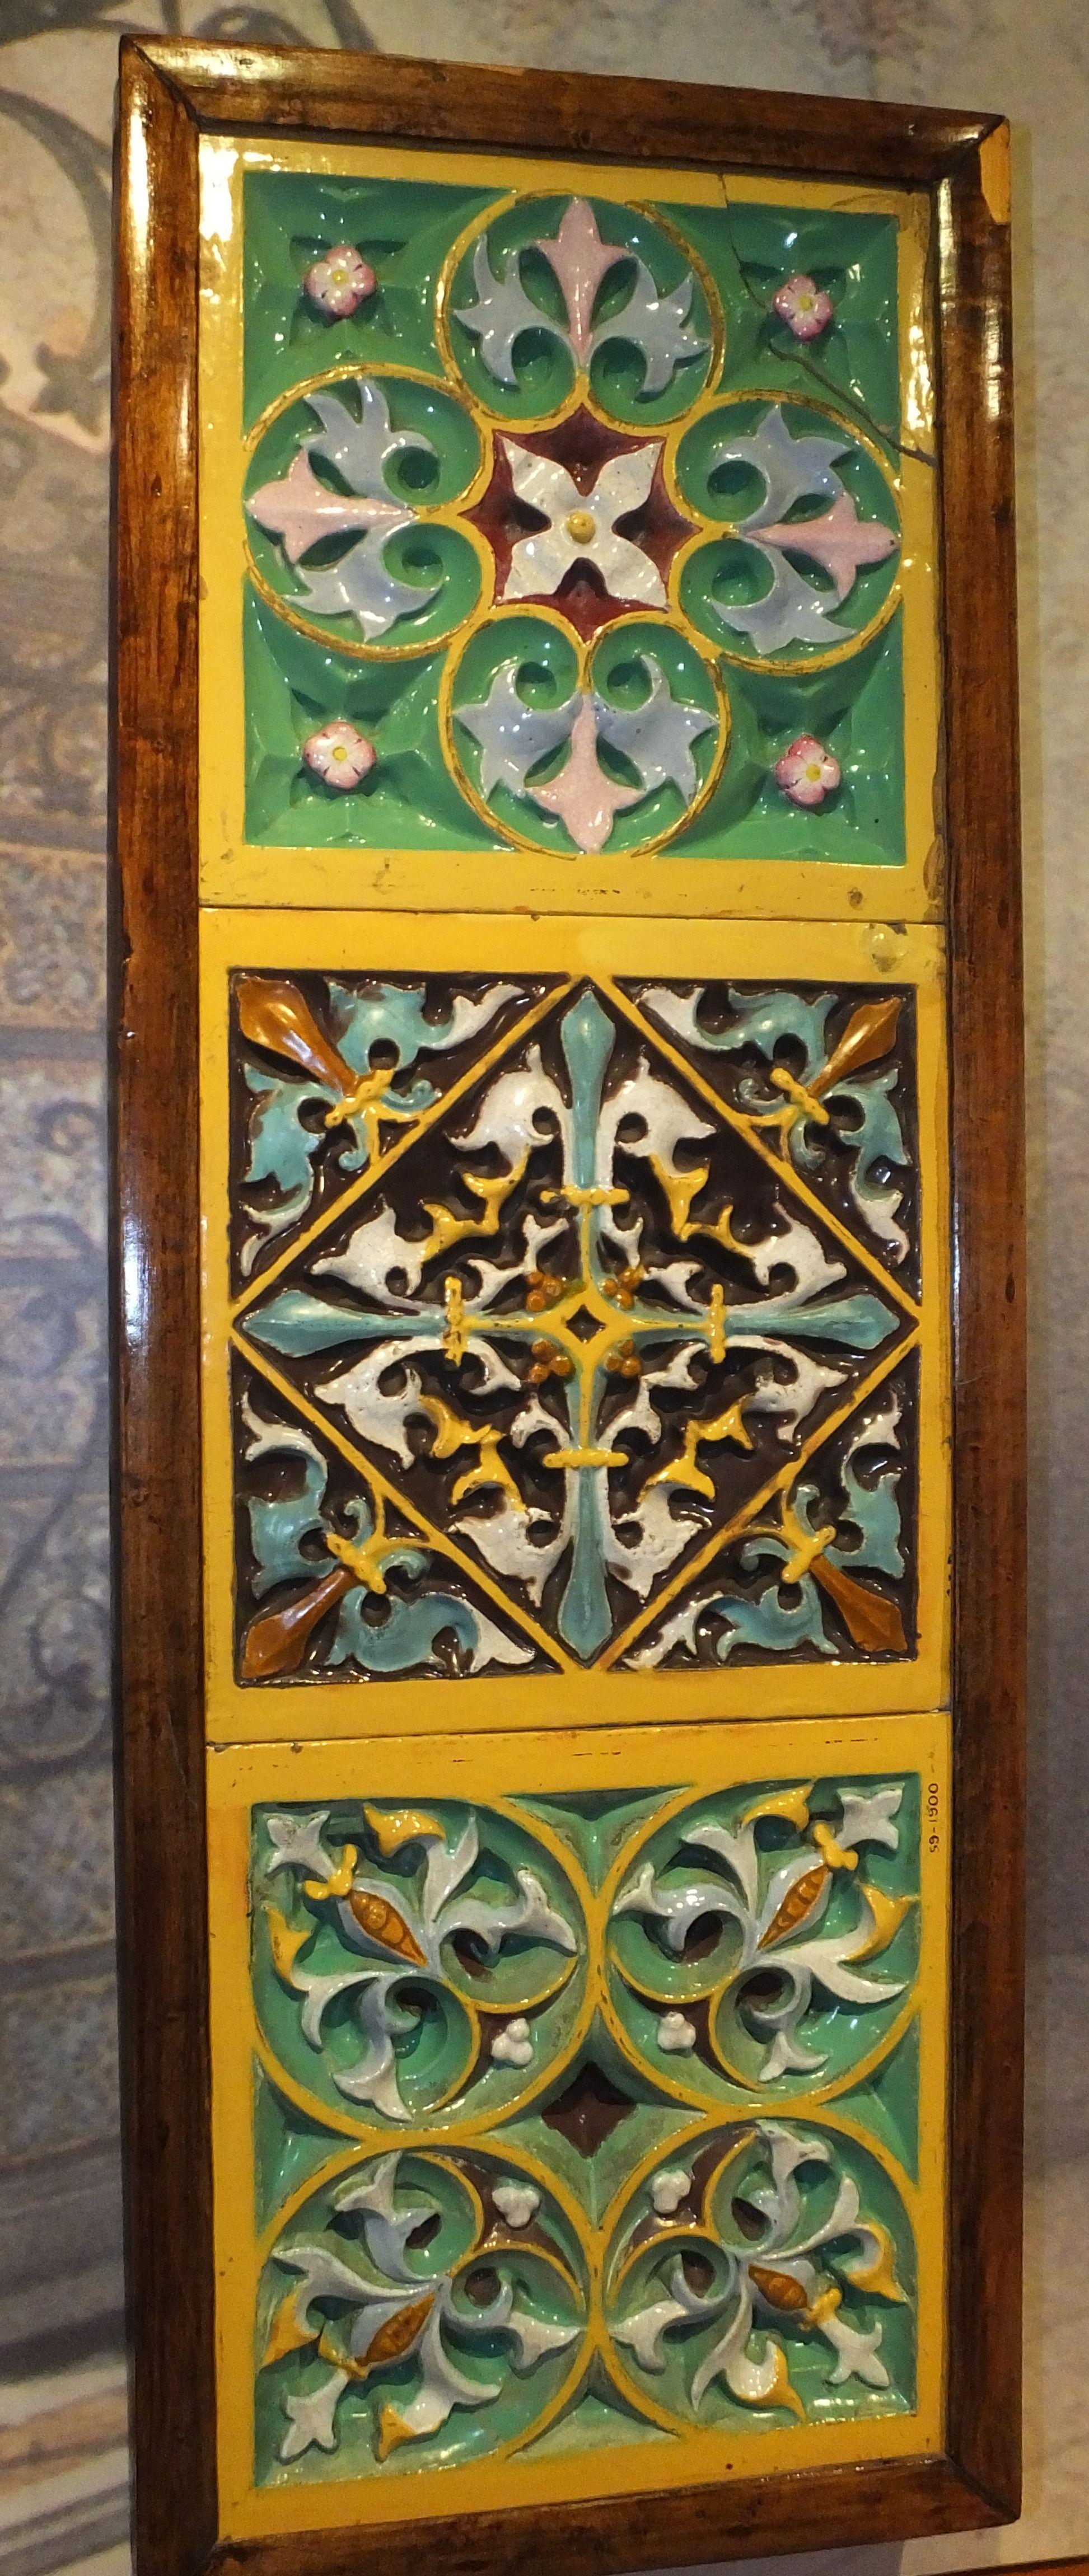 FileGladstone Minton majolica glaze pressed tiles gallery 3875c.JPG & File:Gladstone Minton majolica glaze pressed tiles gallery 3875c.JPG ...